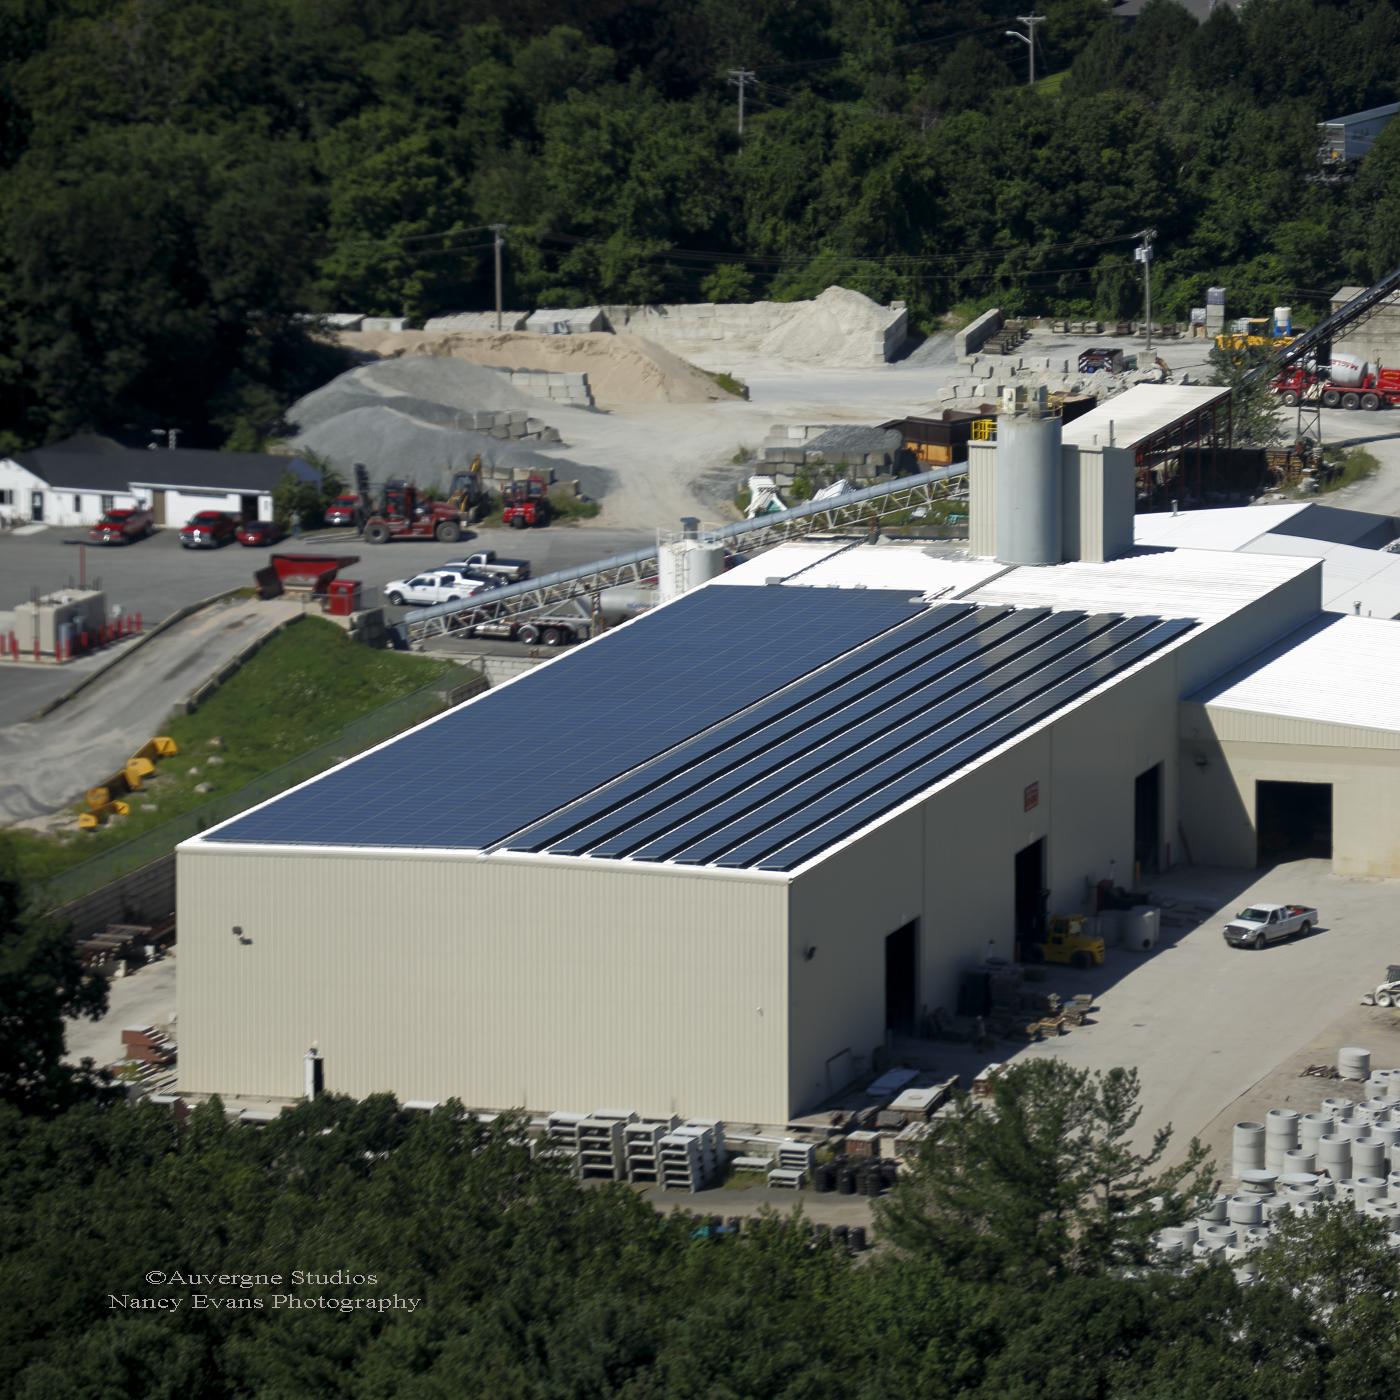 Shea concrete is a 386kW project